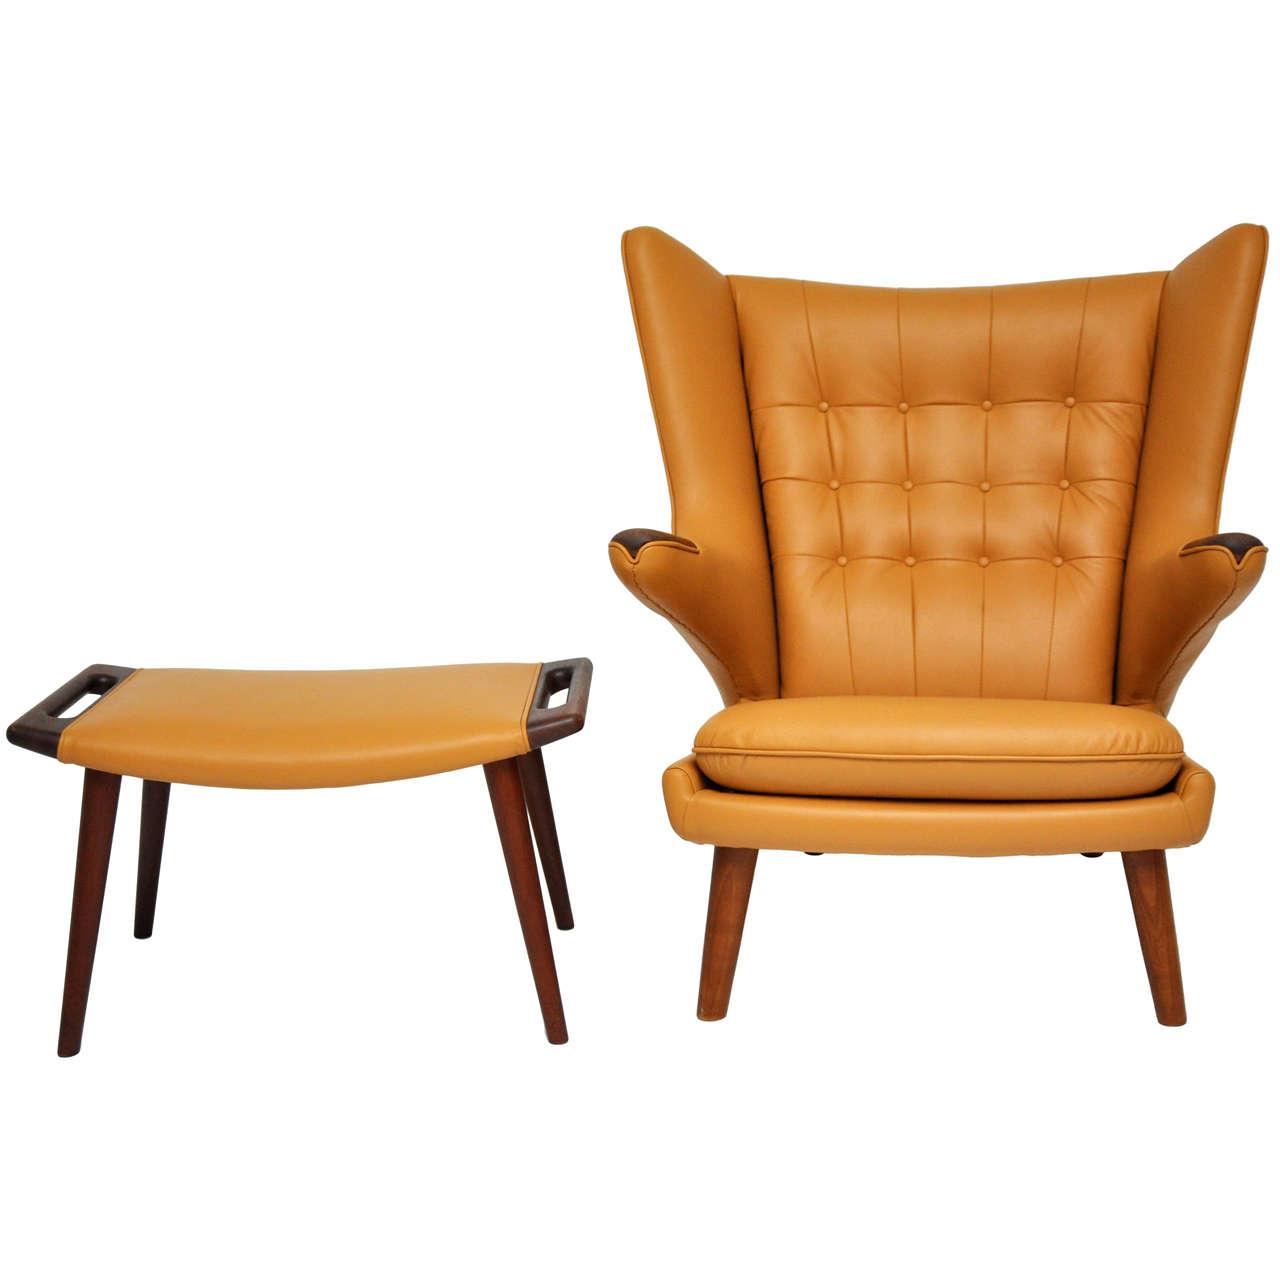 papa bear chair small folding hans wegner and ottoman